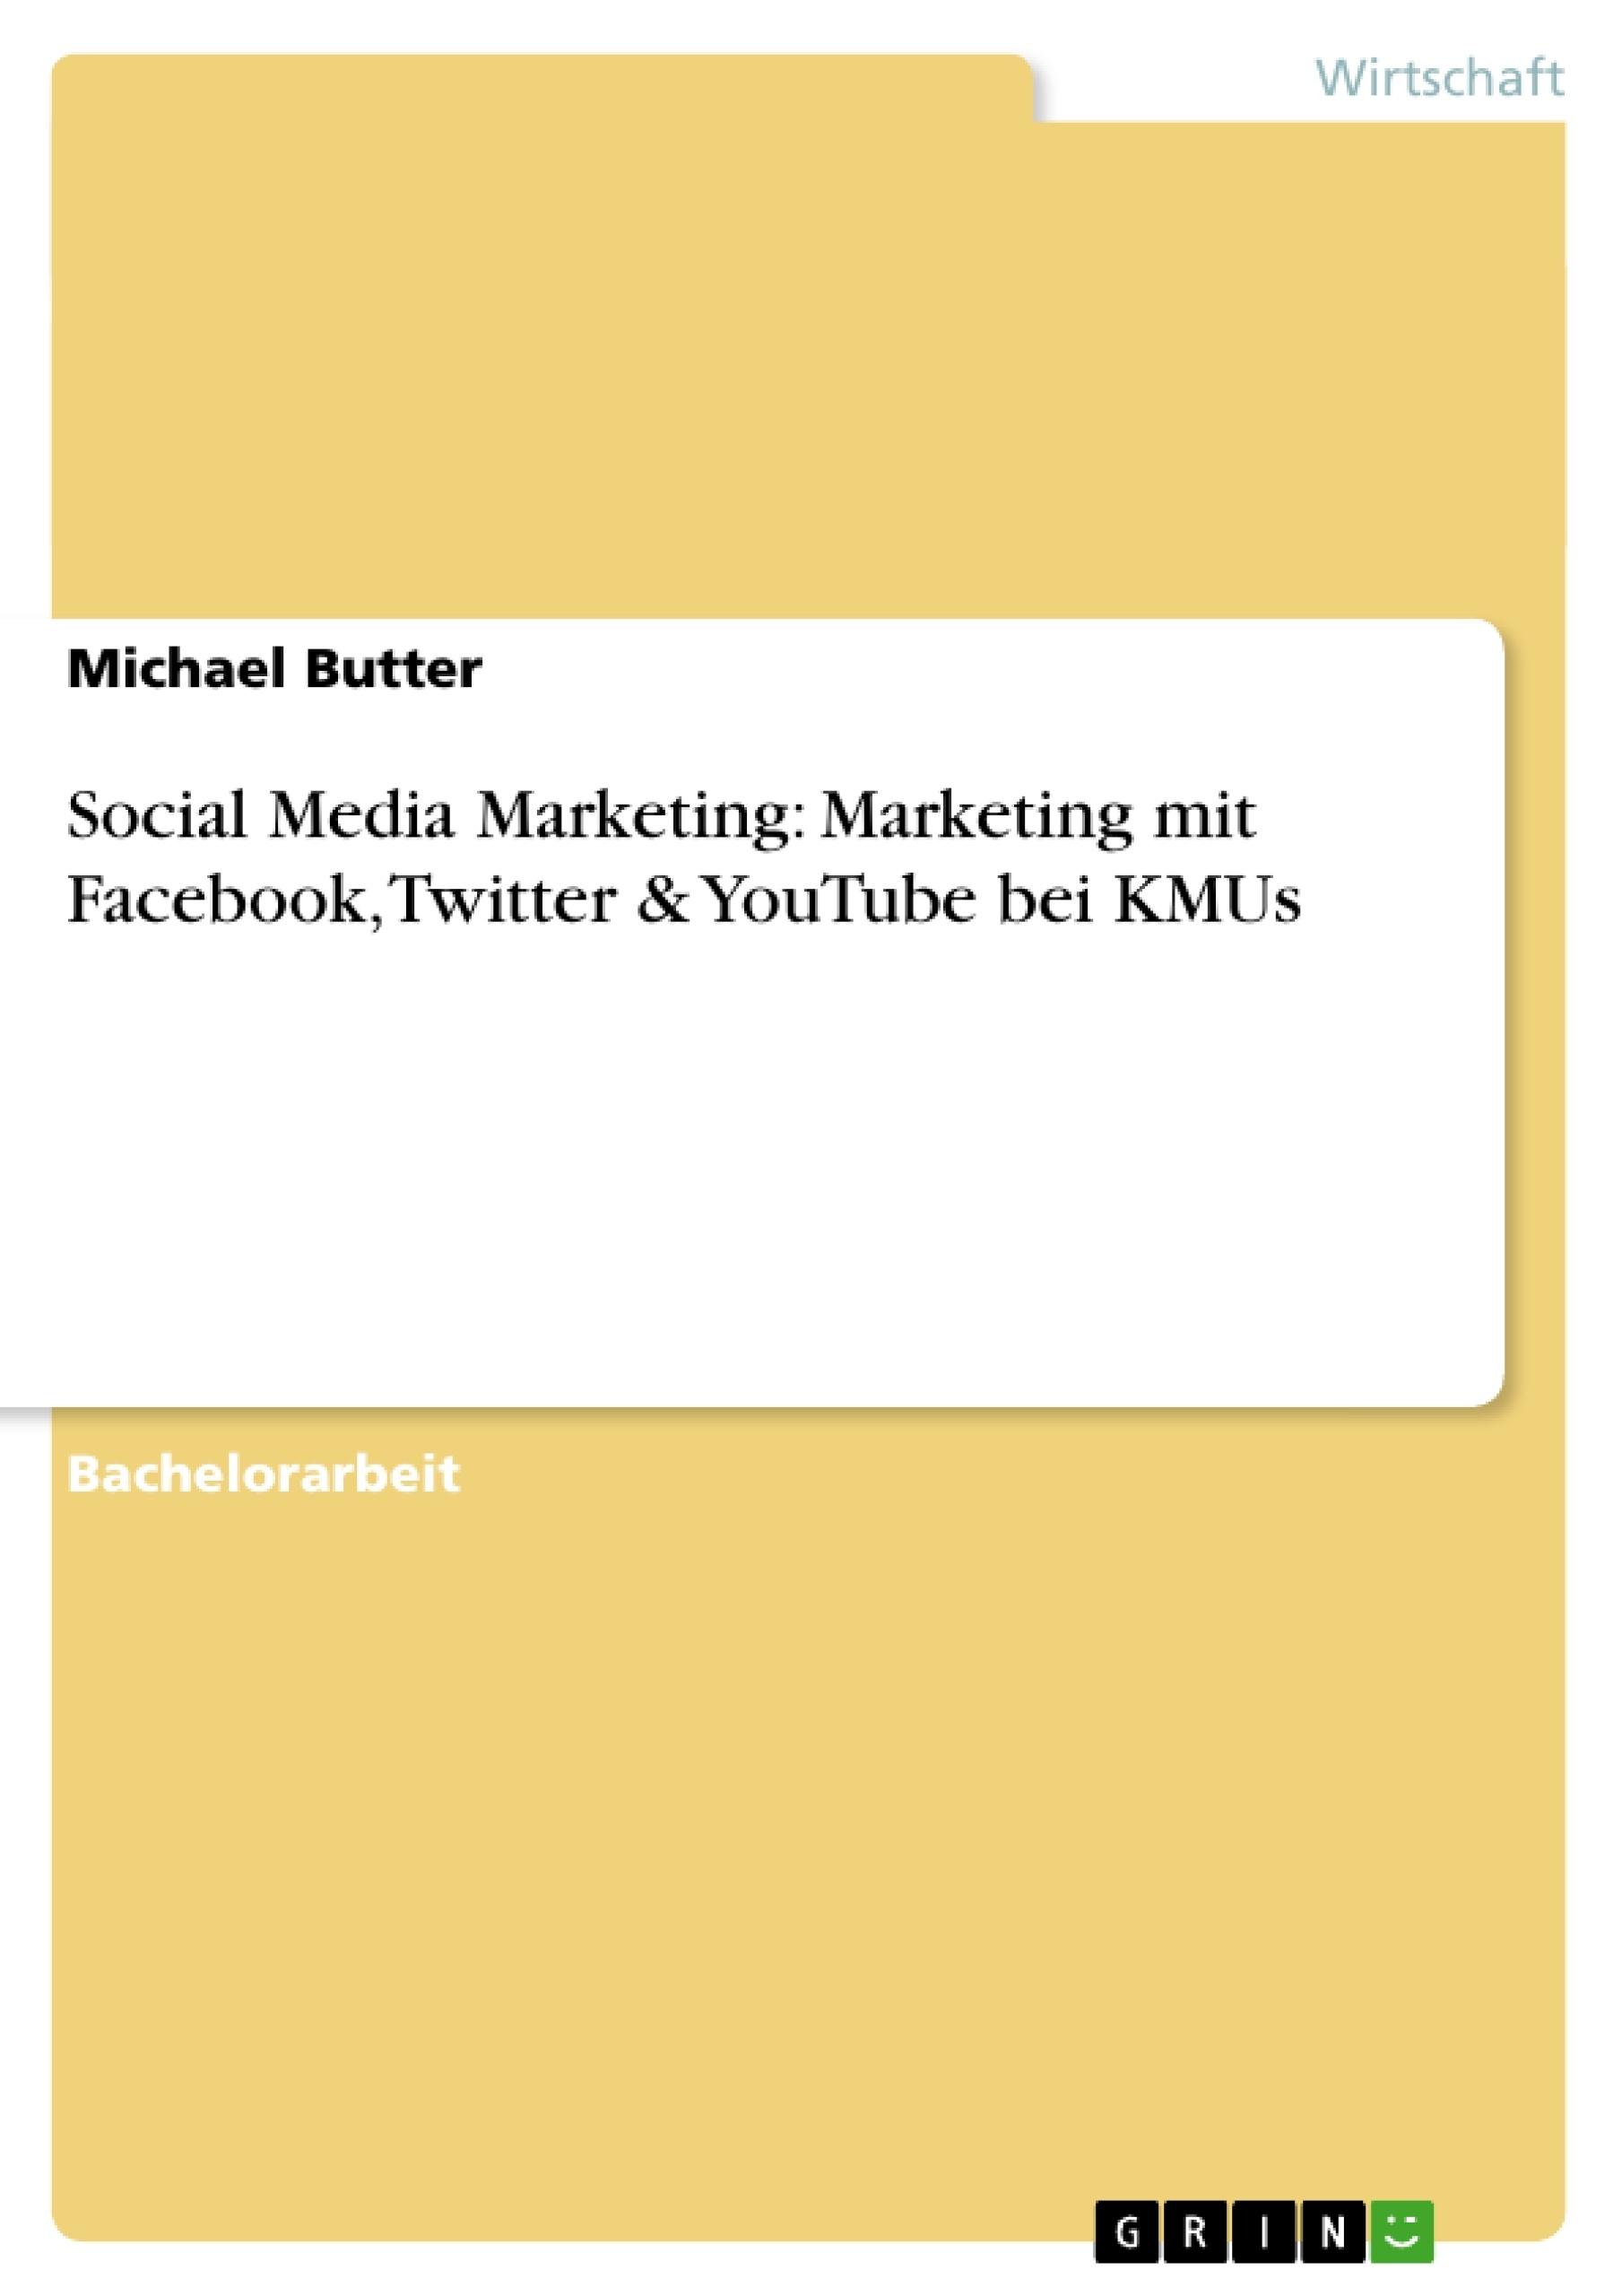 Titel: Social Media Marketing: Marketing mit Facebook, Twitter & YouTube bei KMUs